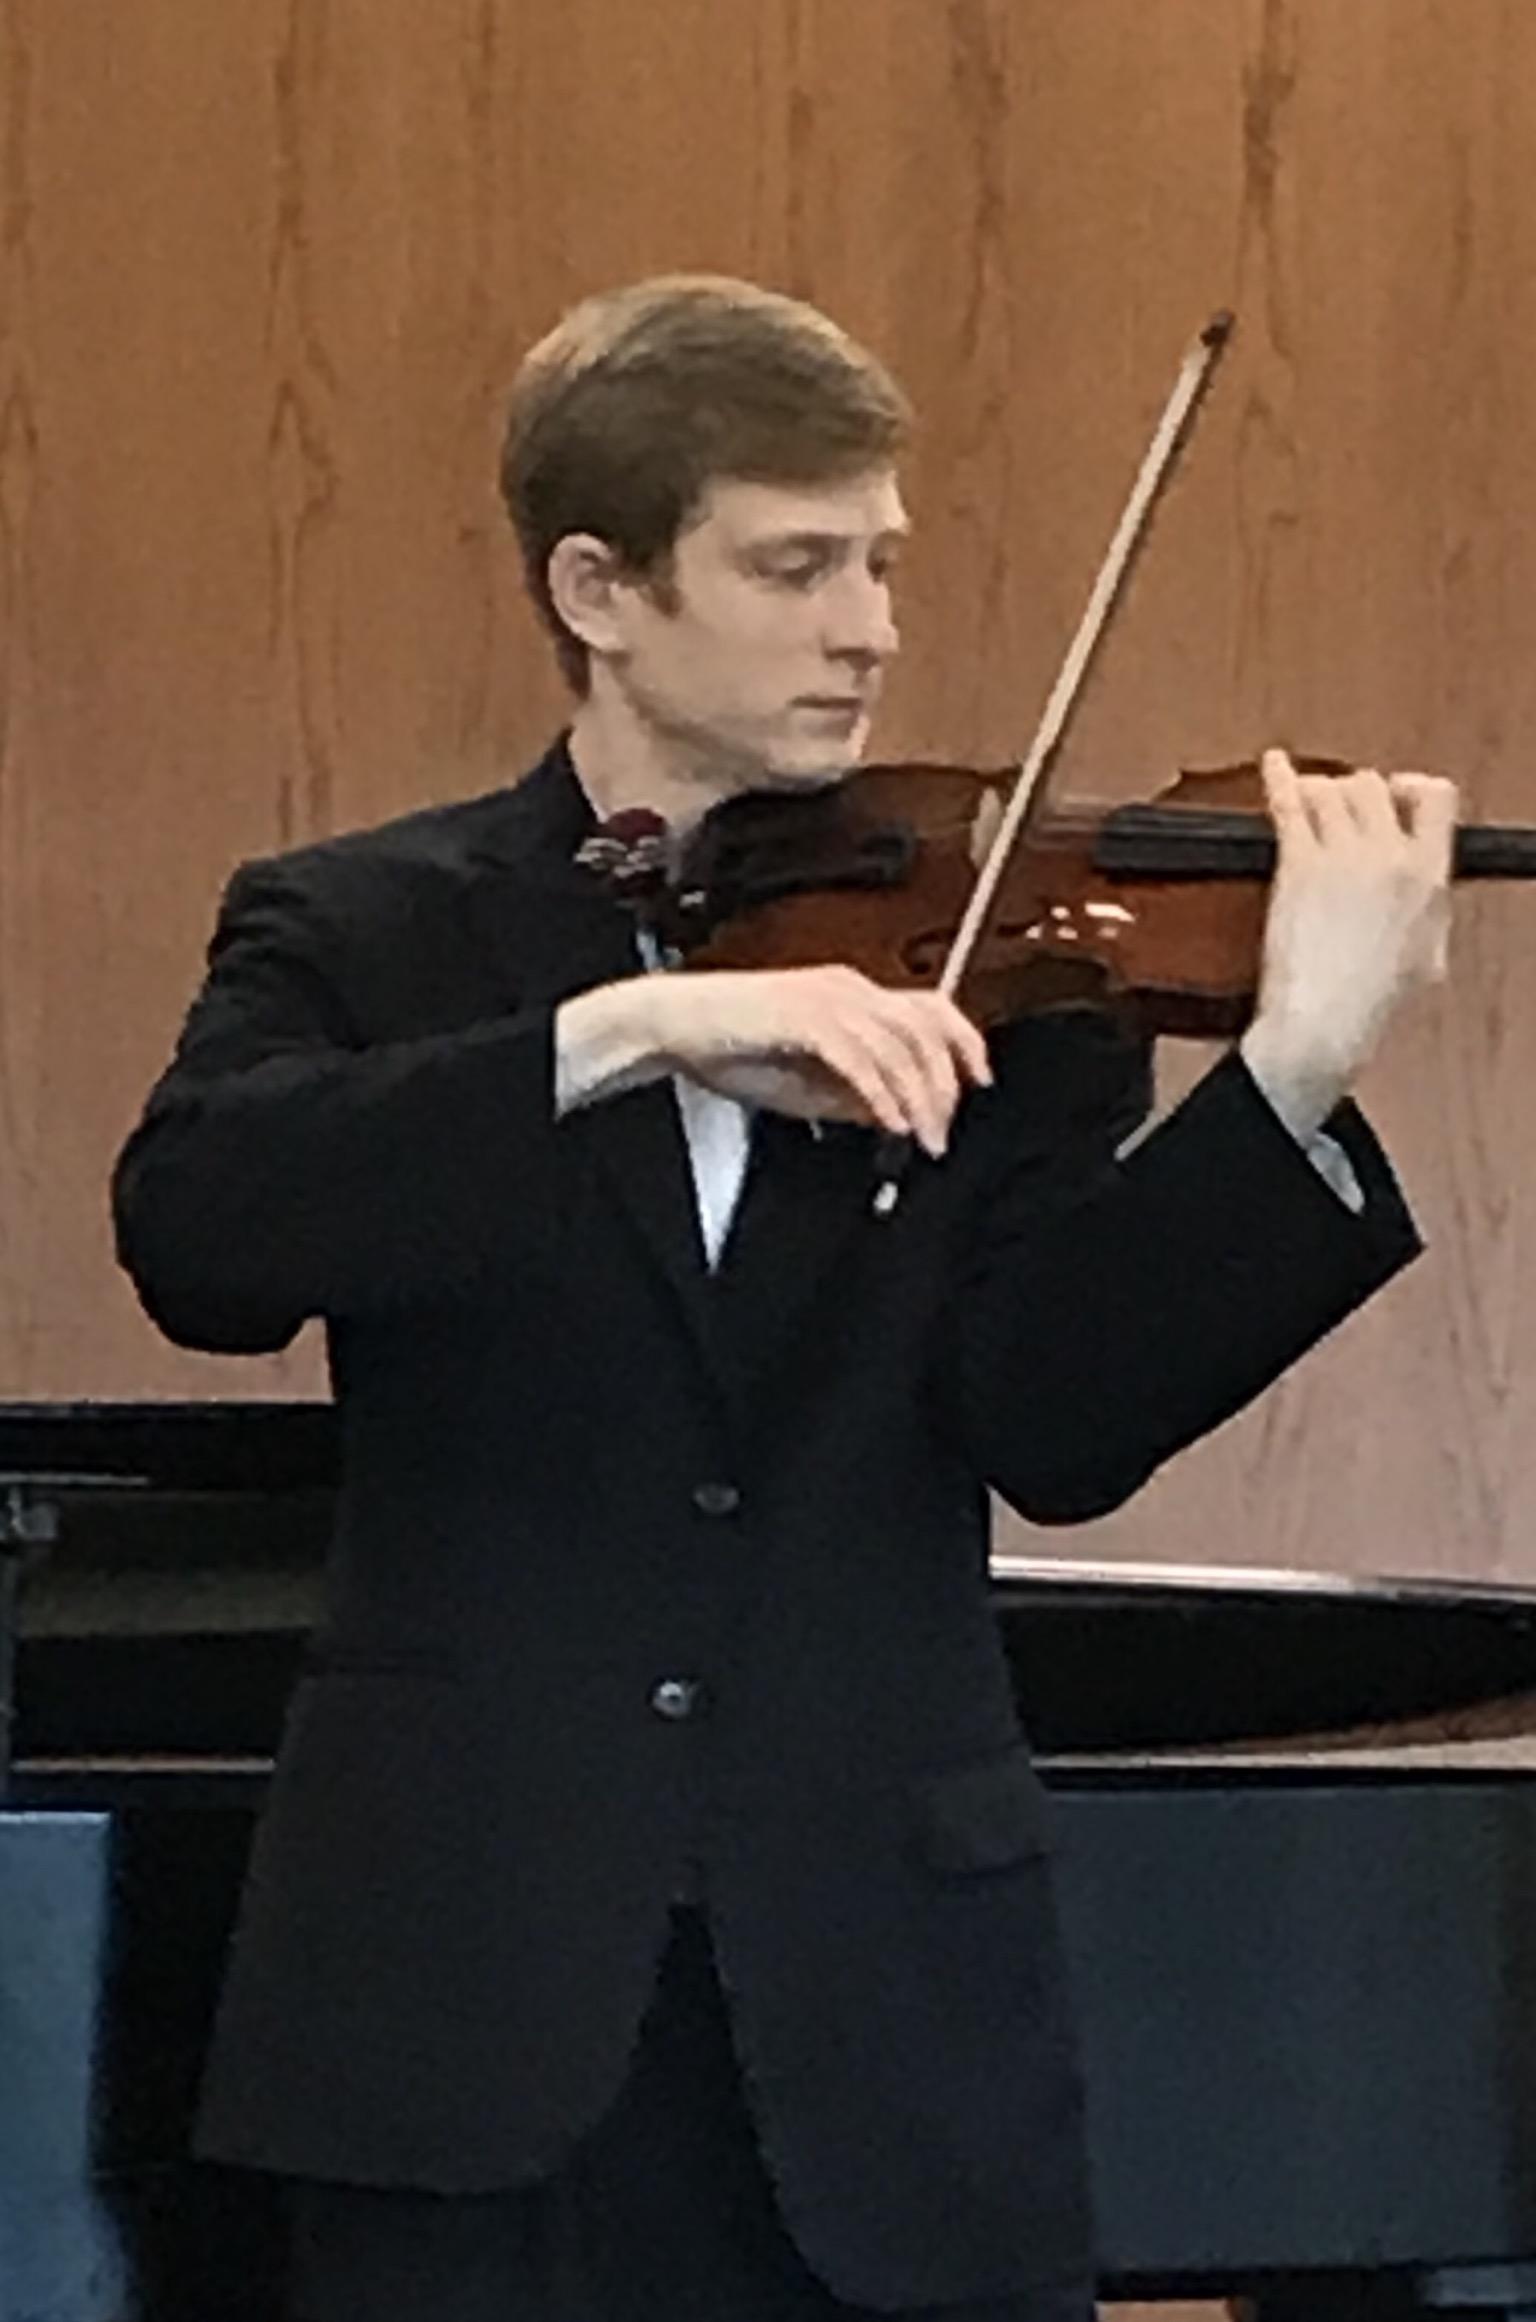 Daniel Ziesemer